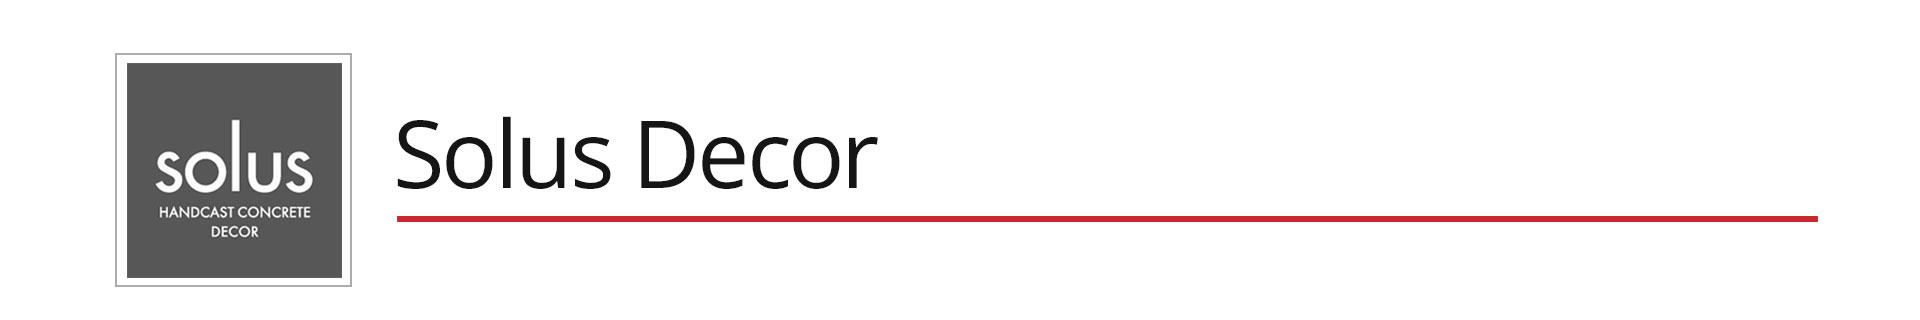 Solus-Decor_CADBlock-Header.jpg